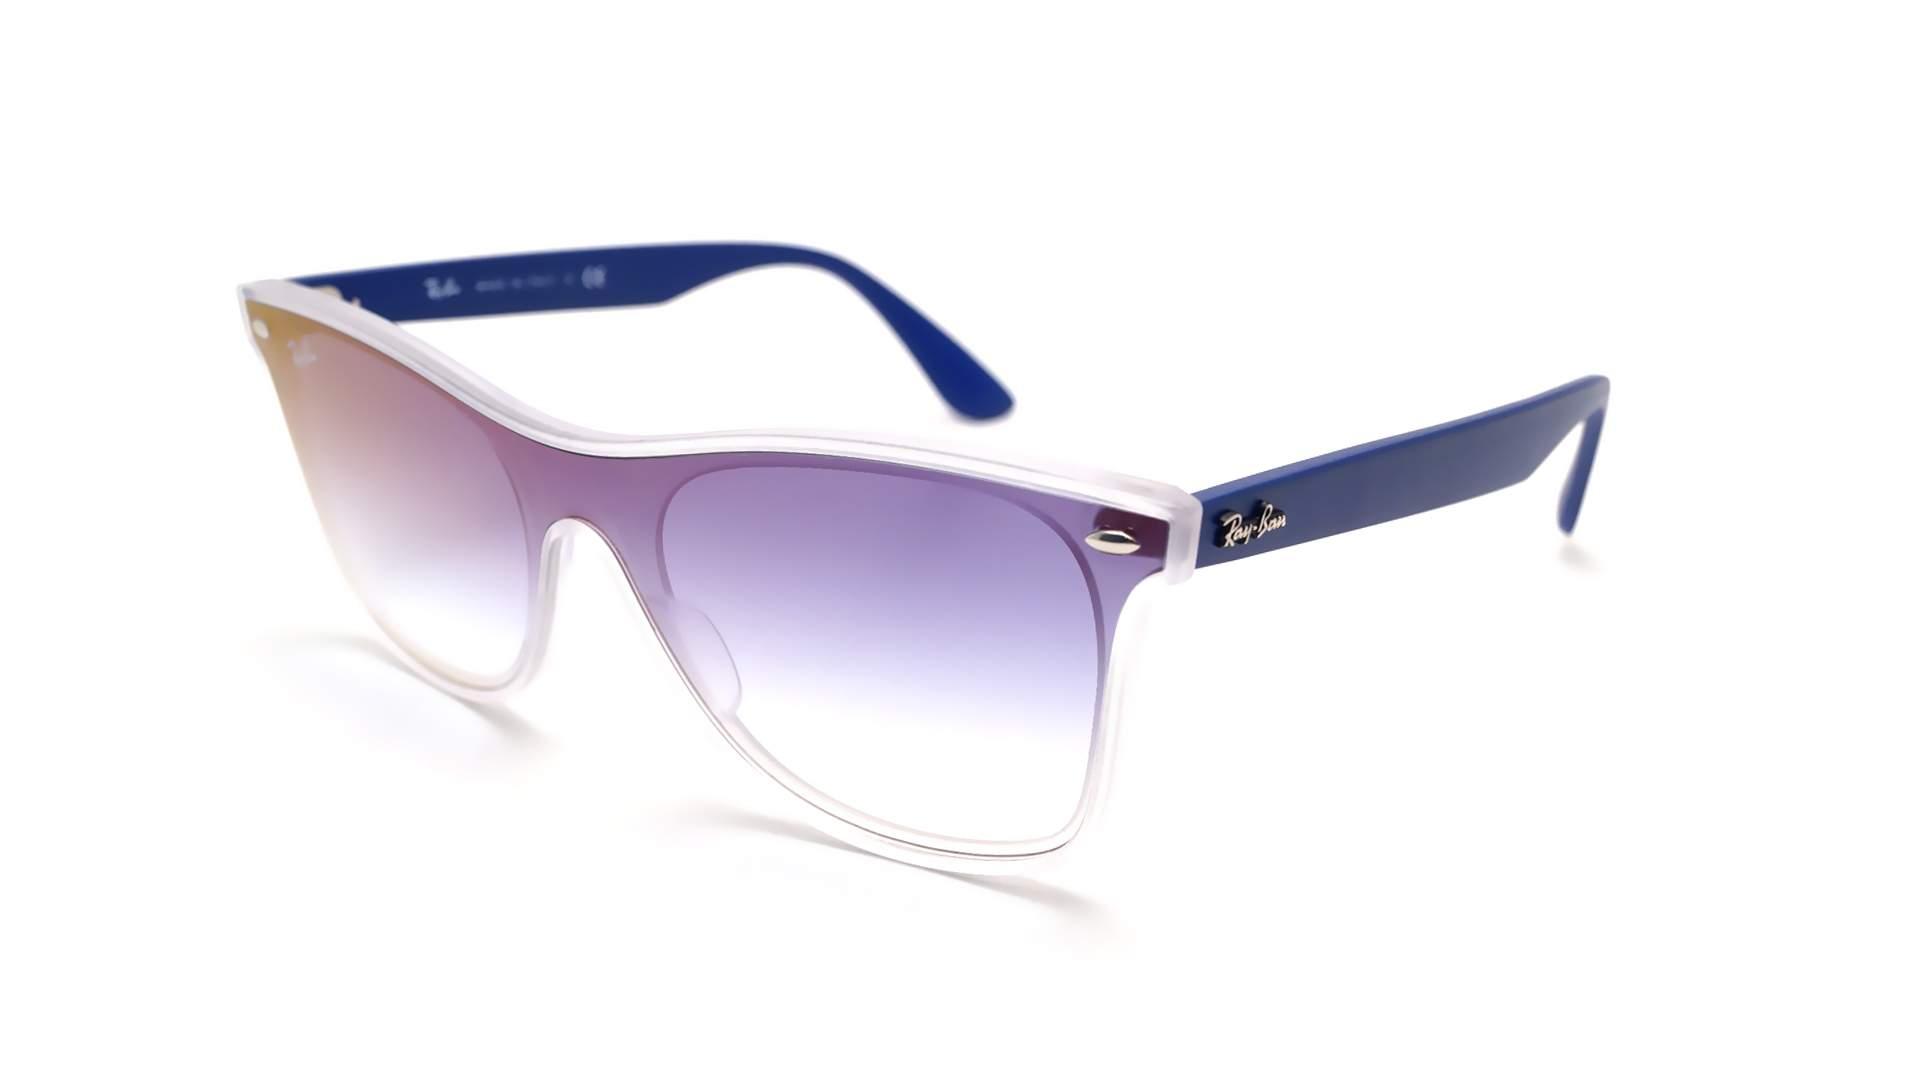 0402a2cb46 Sunglasses Ray-Ban Wayfarer Blaze Blue RB4440N 6356 X0 41-18 Medium  Gradient Mirror